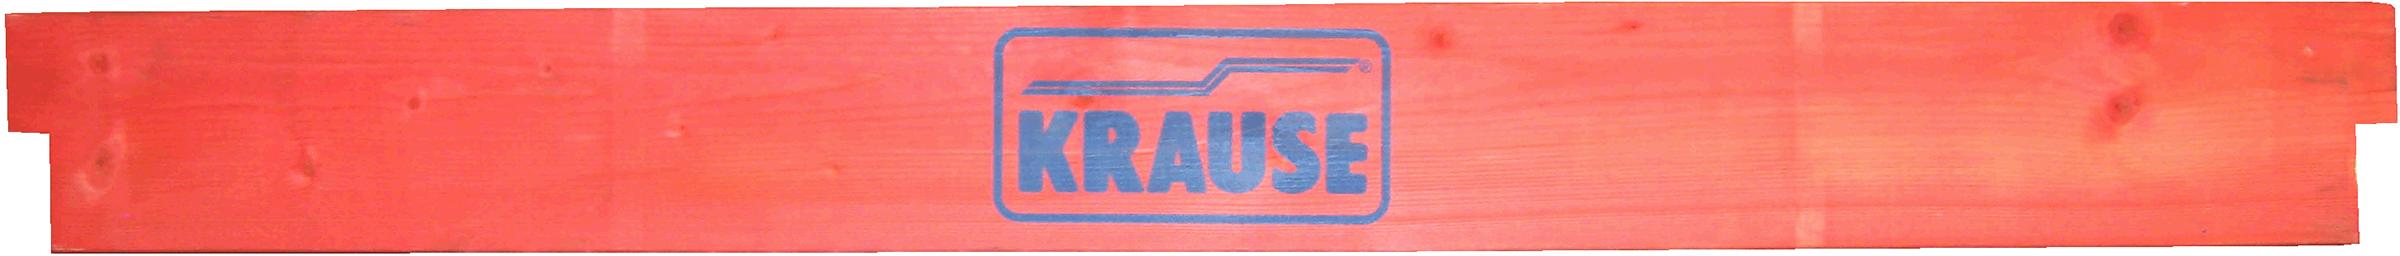 Krause Rollgerüst ProTec Längsbord 2,00 m